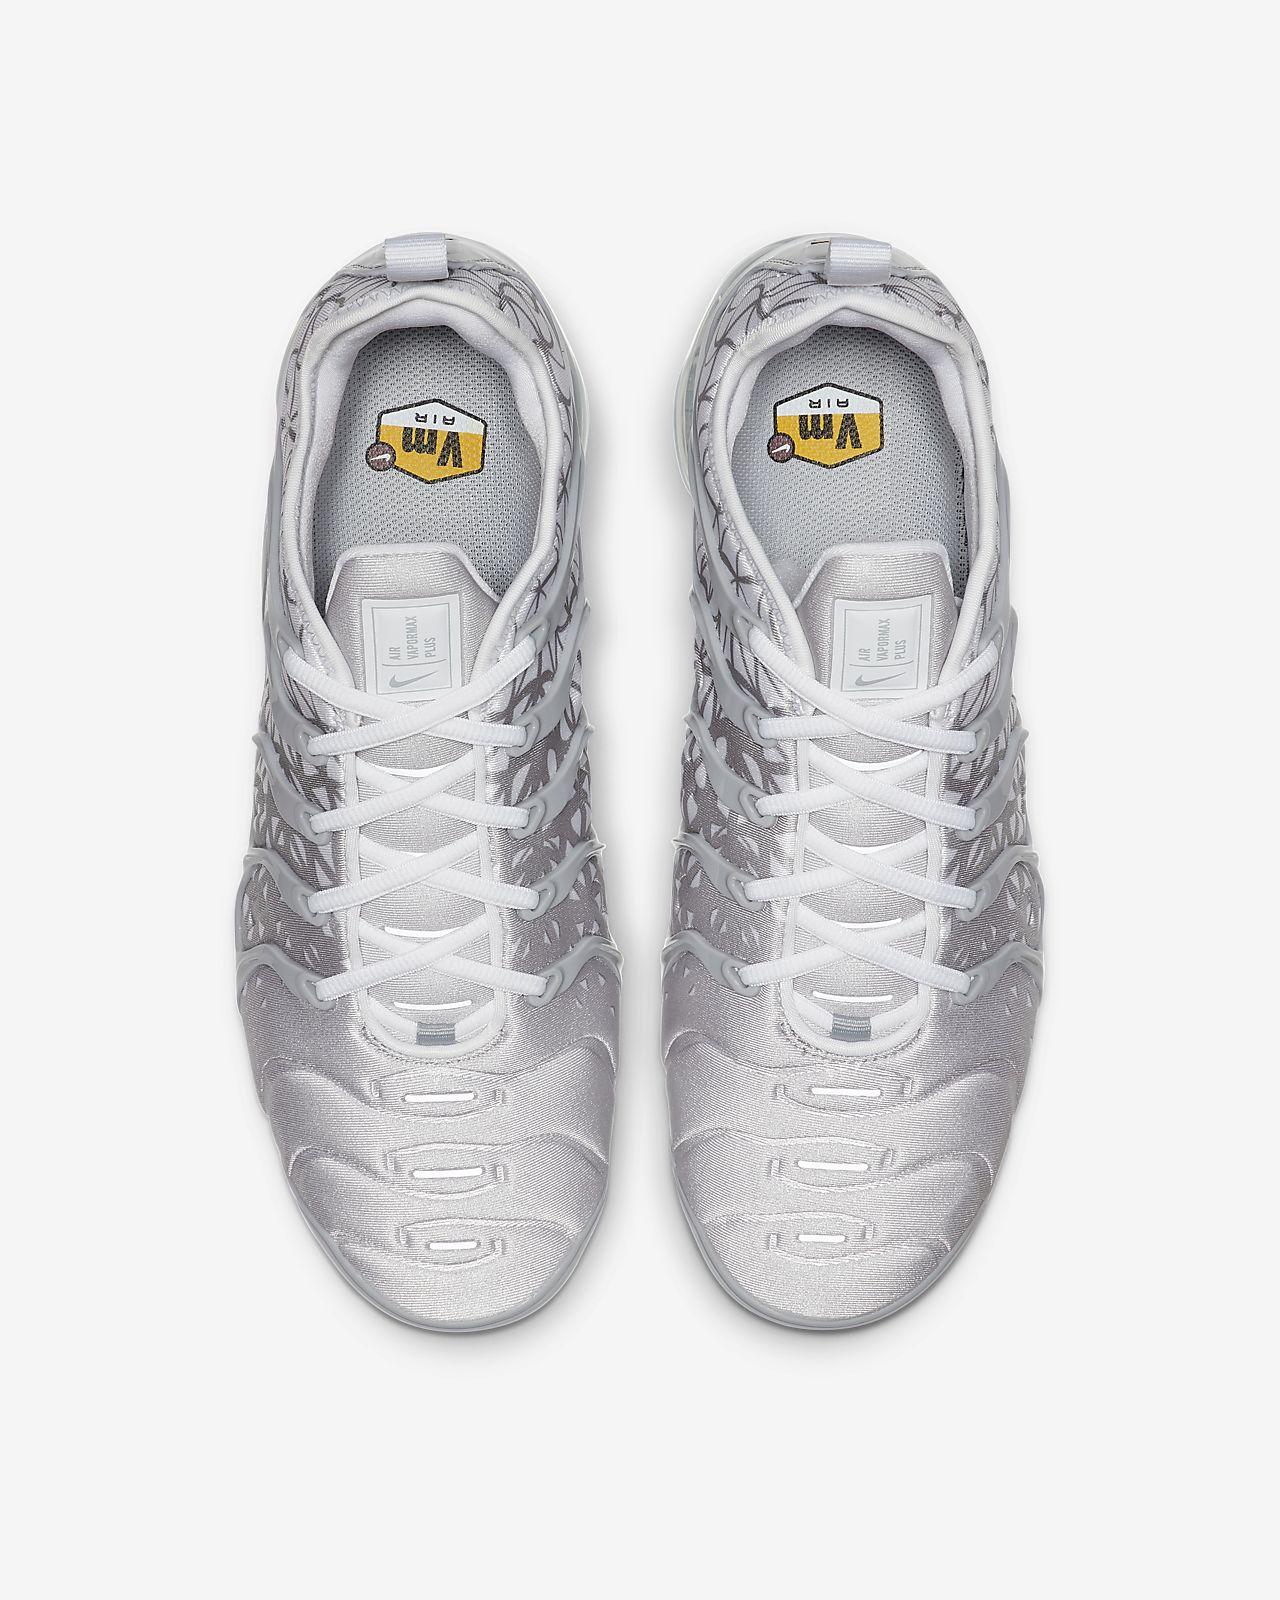 factory price a75f2 64ff5 Nike Air VaporMax Plus Men's Shoe. Nike.com GB